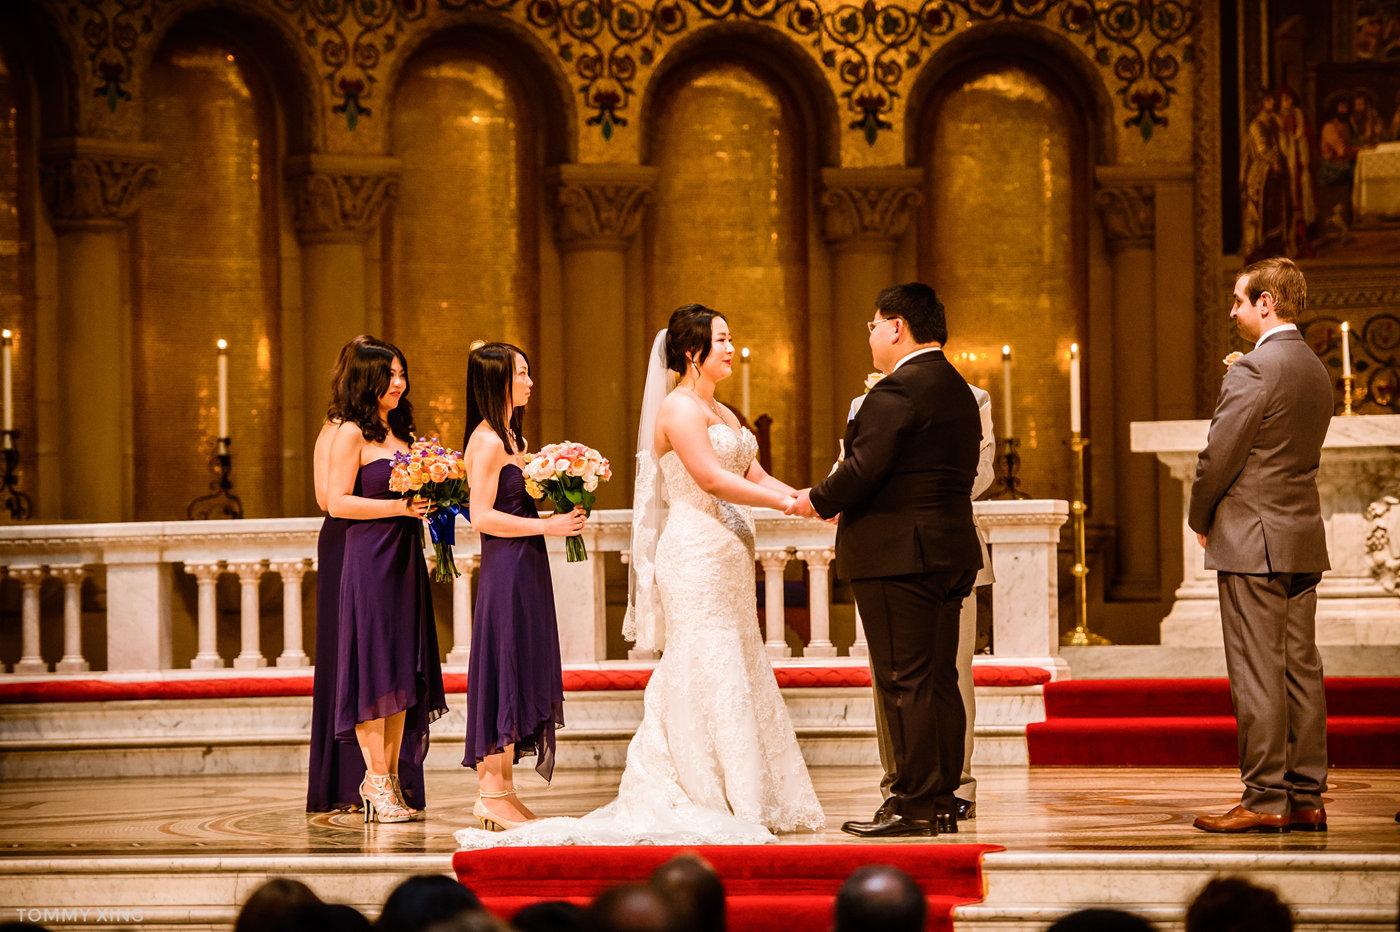 STANFORD MEMORIAL CHURCH WEDDING - Wenjie & Chengcheng - SAN FRANCISCO BAY AREA 斯坦福教堂婚礼跟拍 - 洛杉矶婚礼婚纱照摄影师 Tommy Xing Photography100.jpg